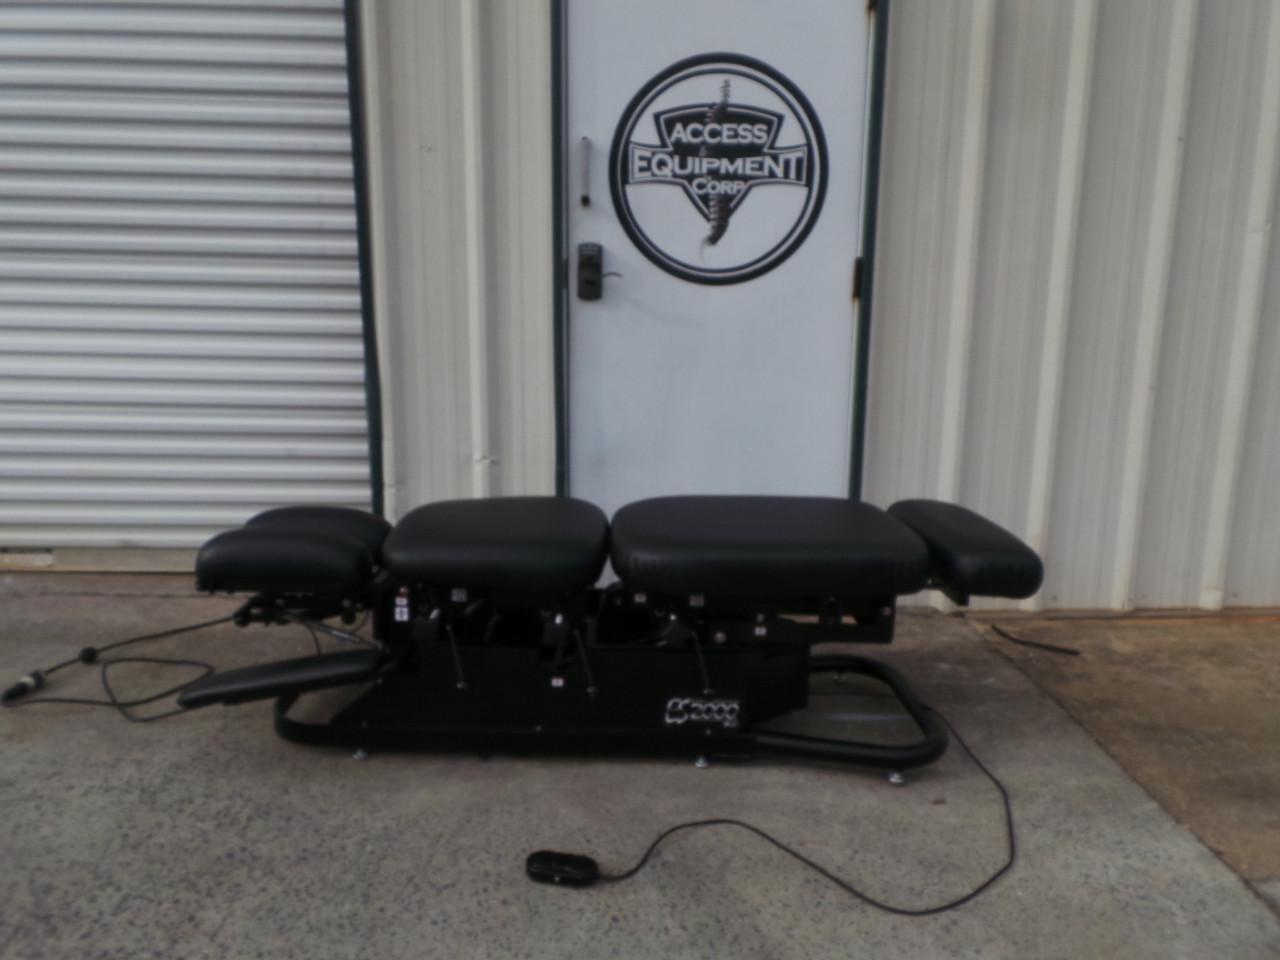 Used Chattanooga ES 2000 Elevation Table- Black Upholstery